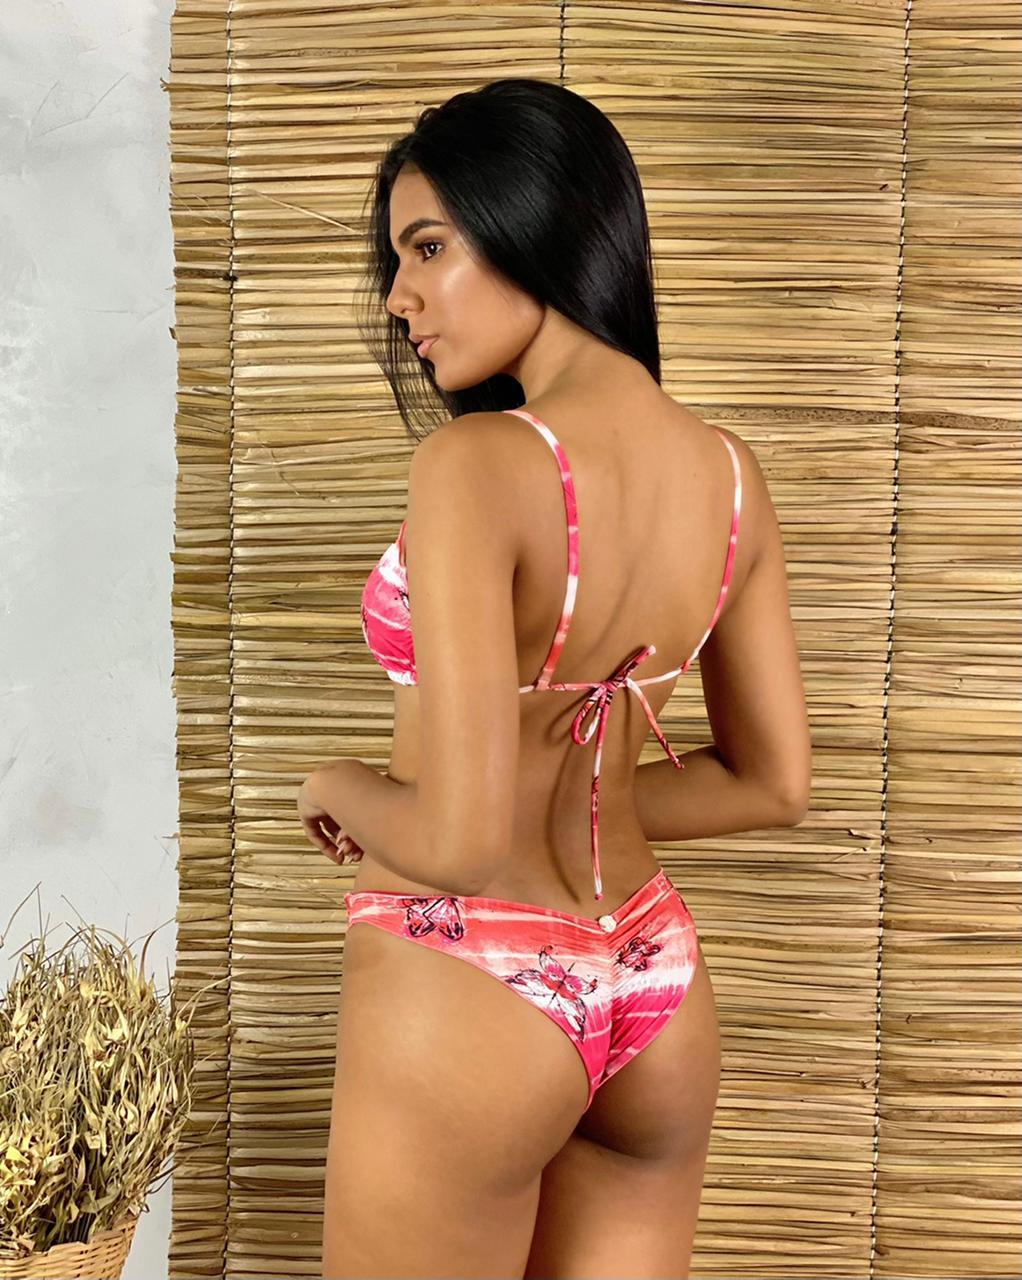 Calcinha Ripple Butterfly  - RMCE BRAZIL